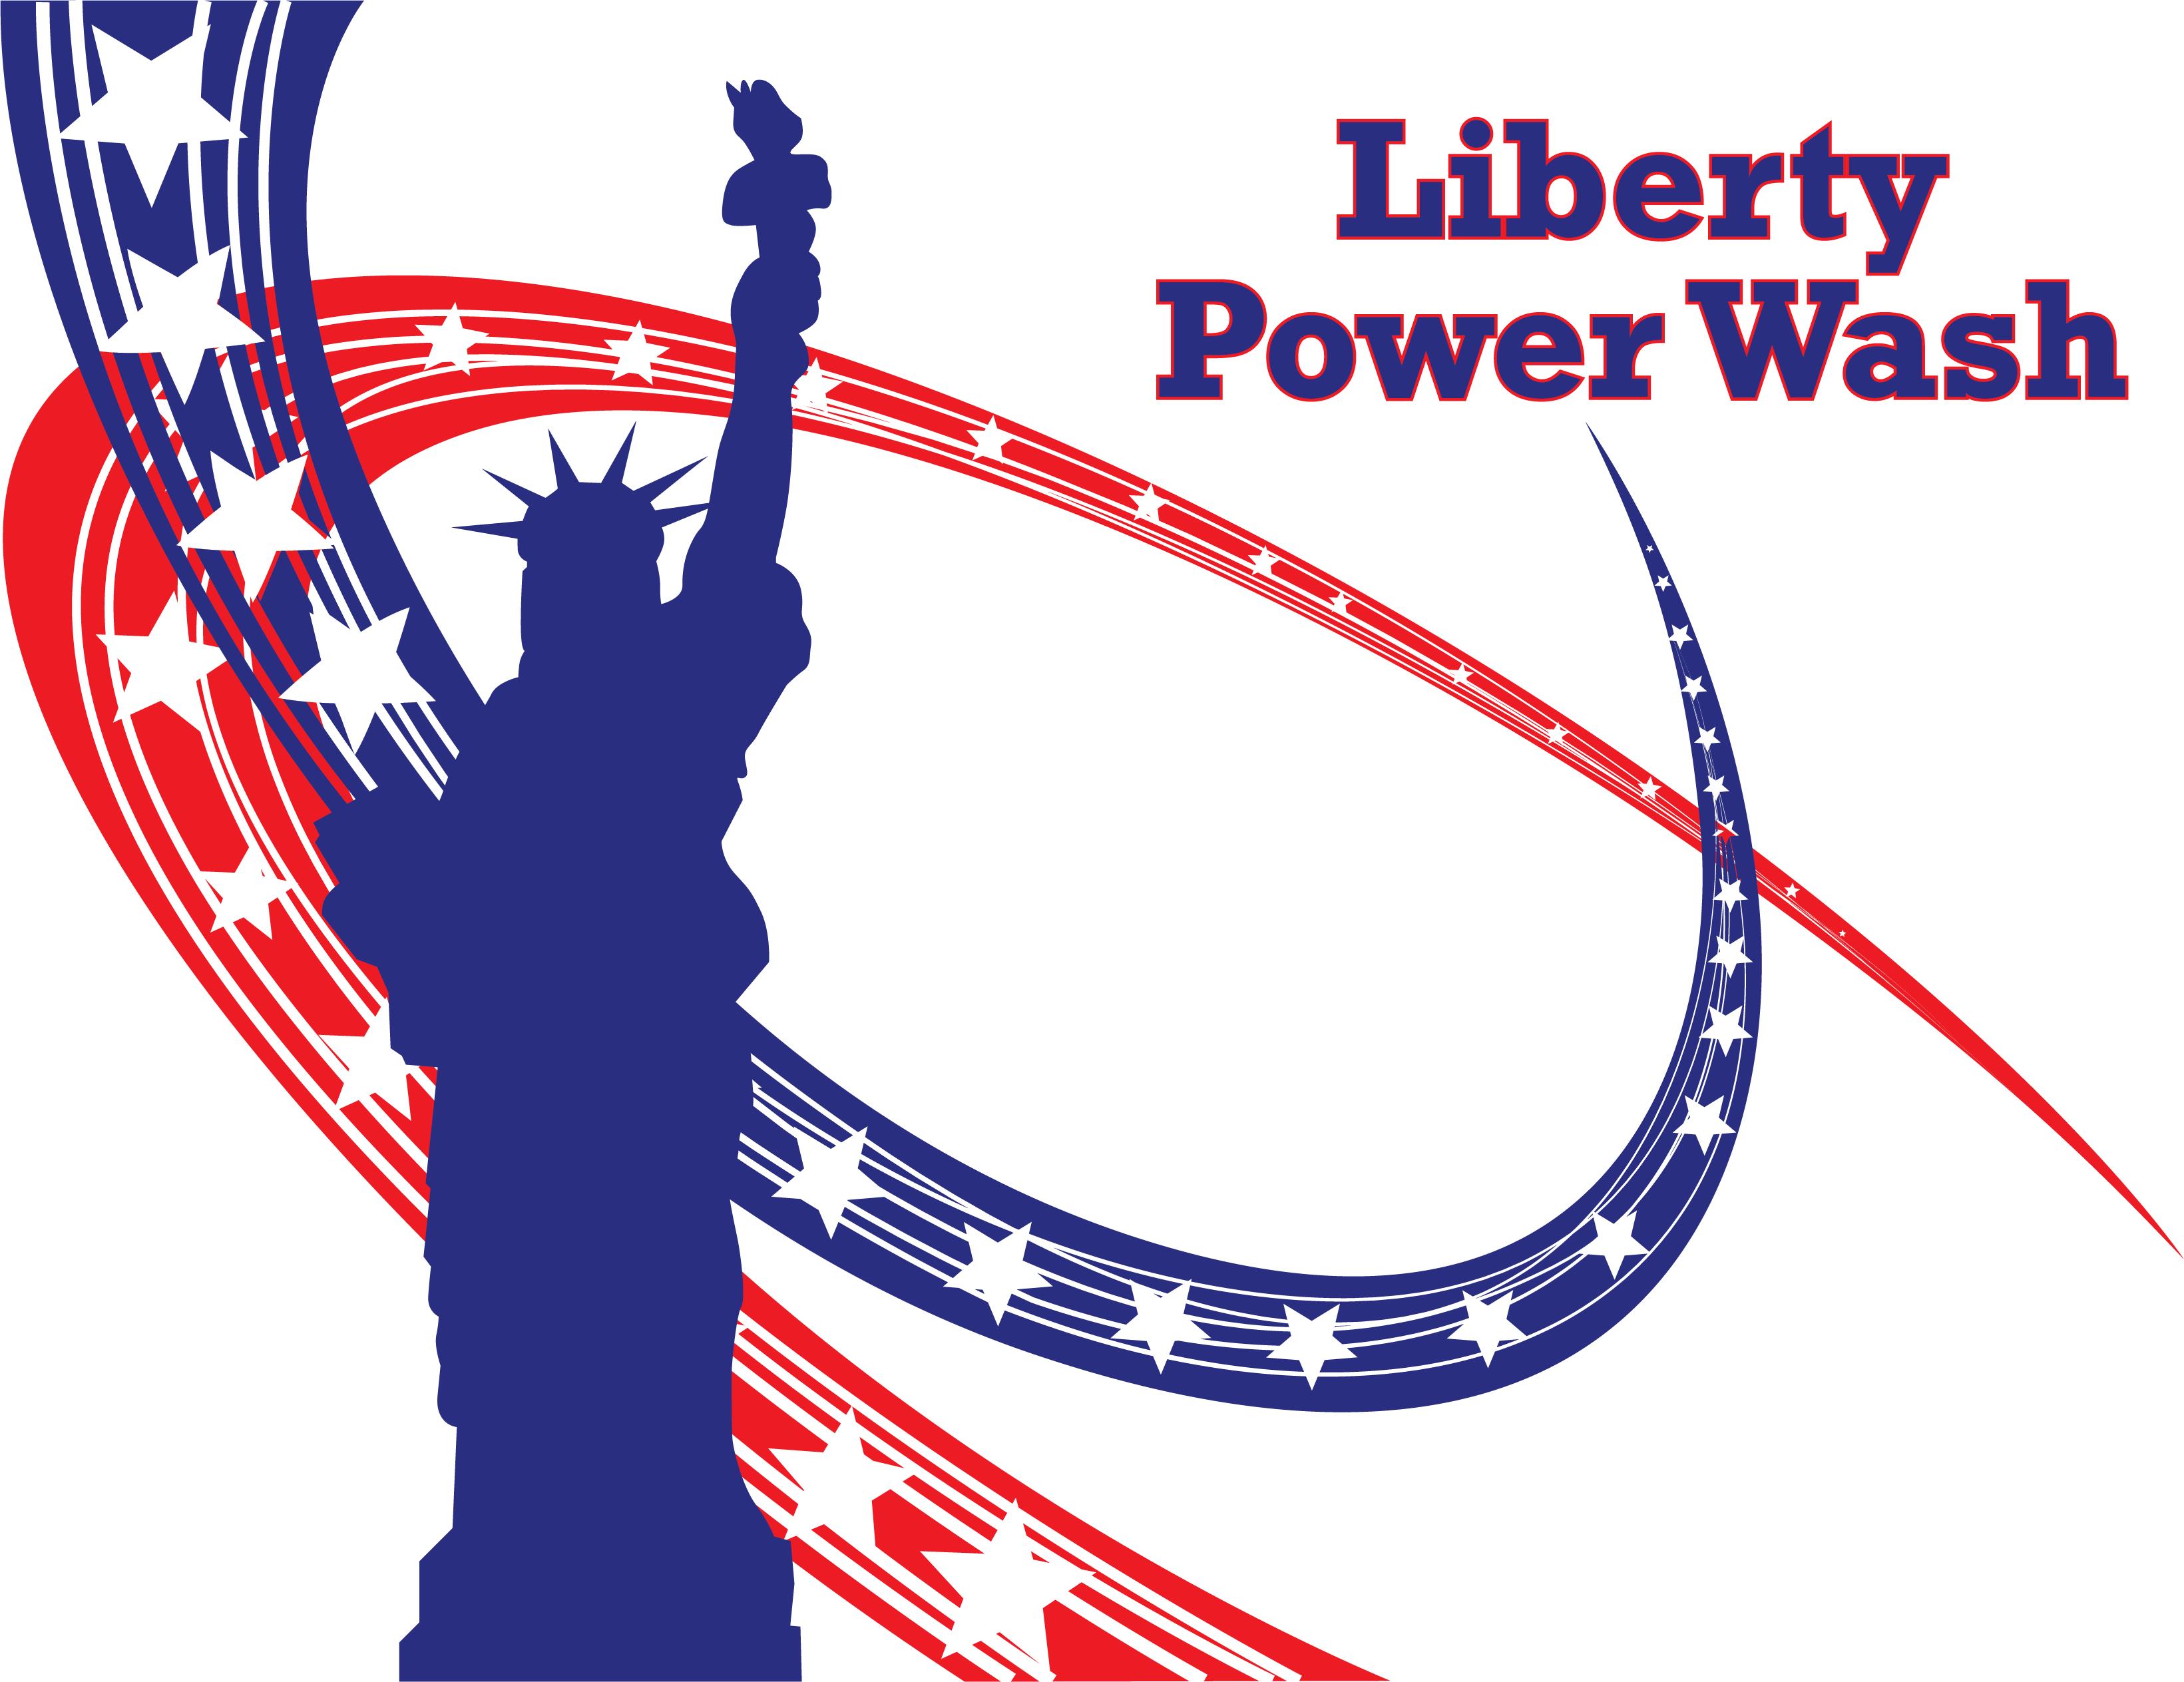 Liberty Power Wash